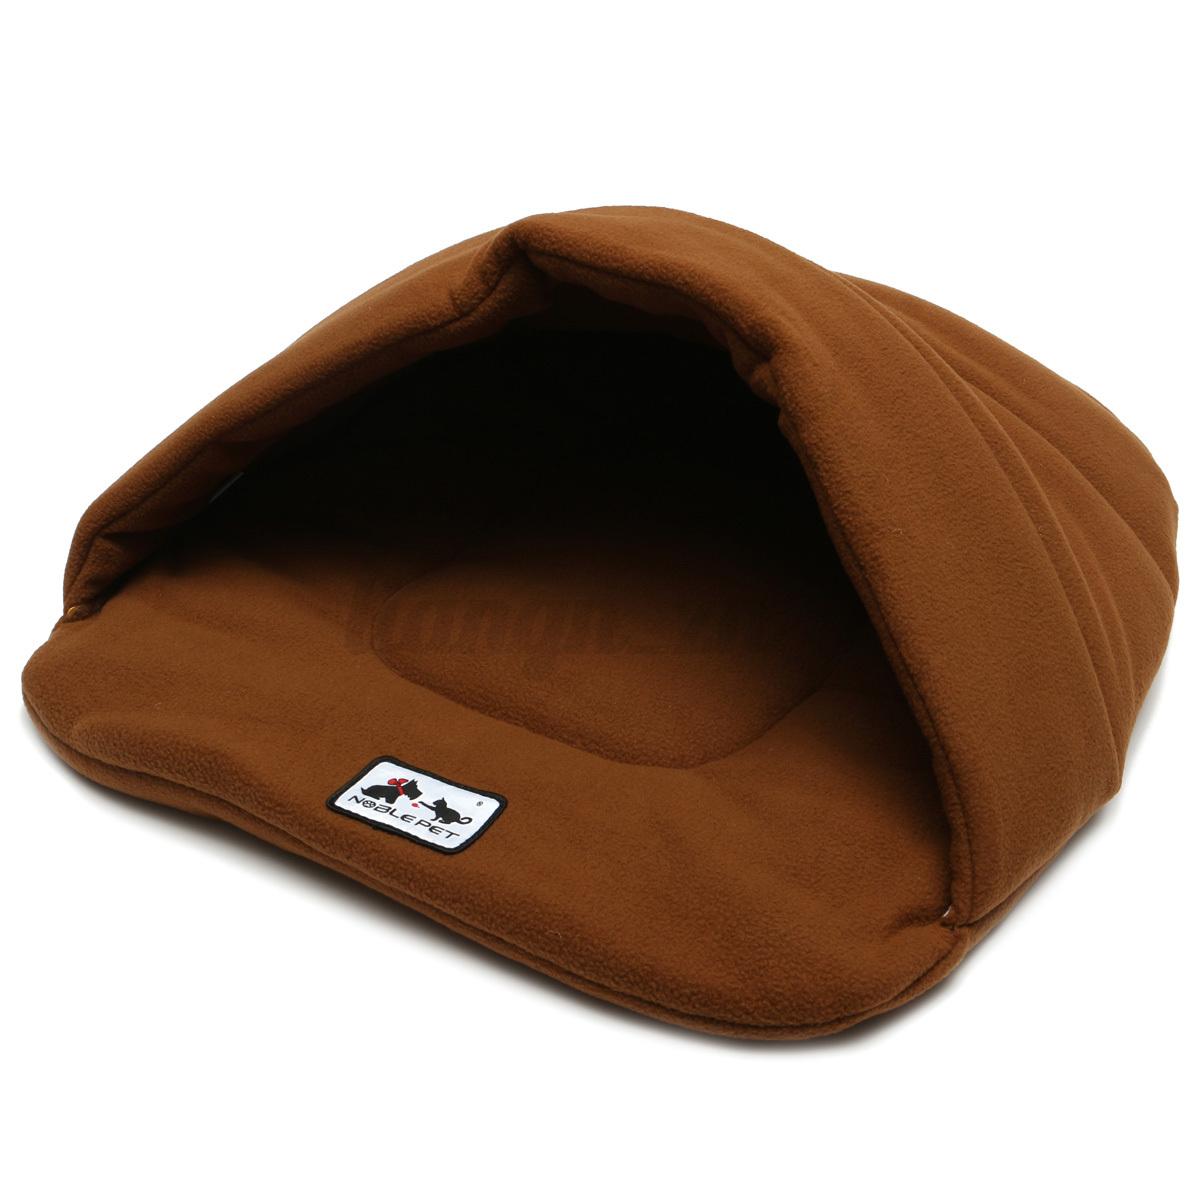 Tapis Coussin Lit Sac De Couchage Fleece Velours Pour Chien Chat Animaux Dog Bed Ebay